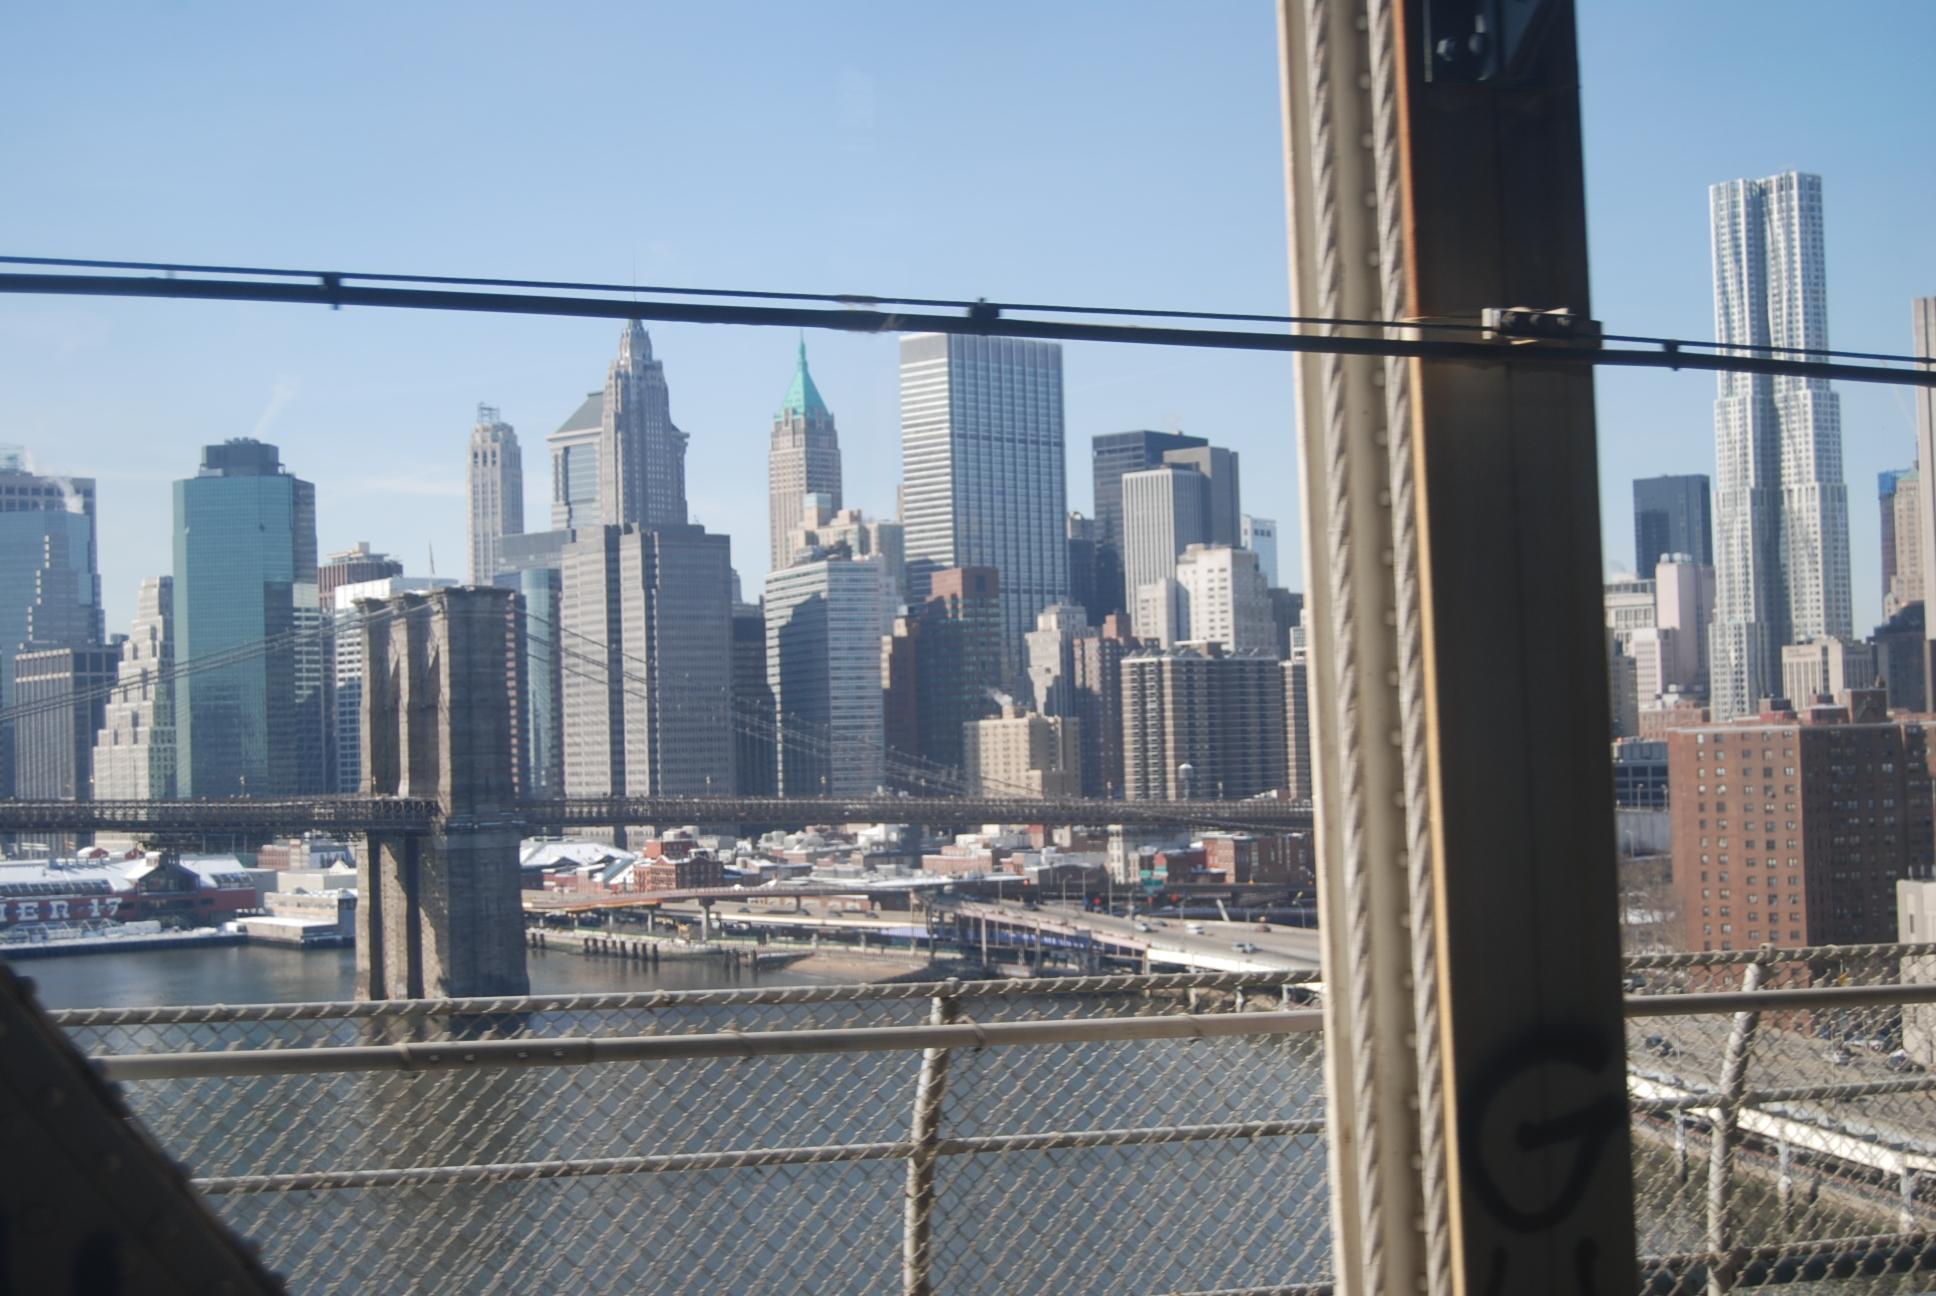 Brooklyn Bridg New York view from subway window 2011